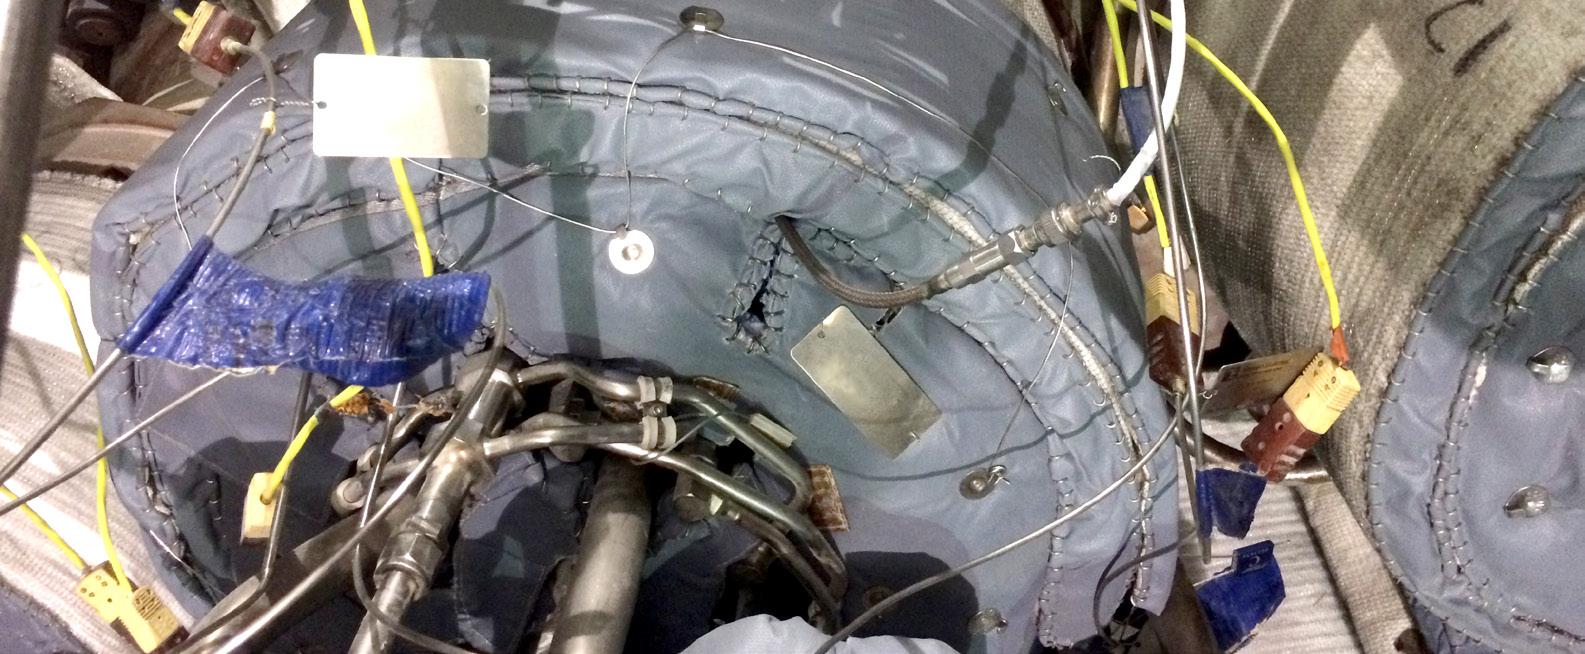 HPS-Anchor-Project-Profile-combustors-1.jpg